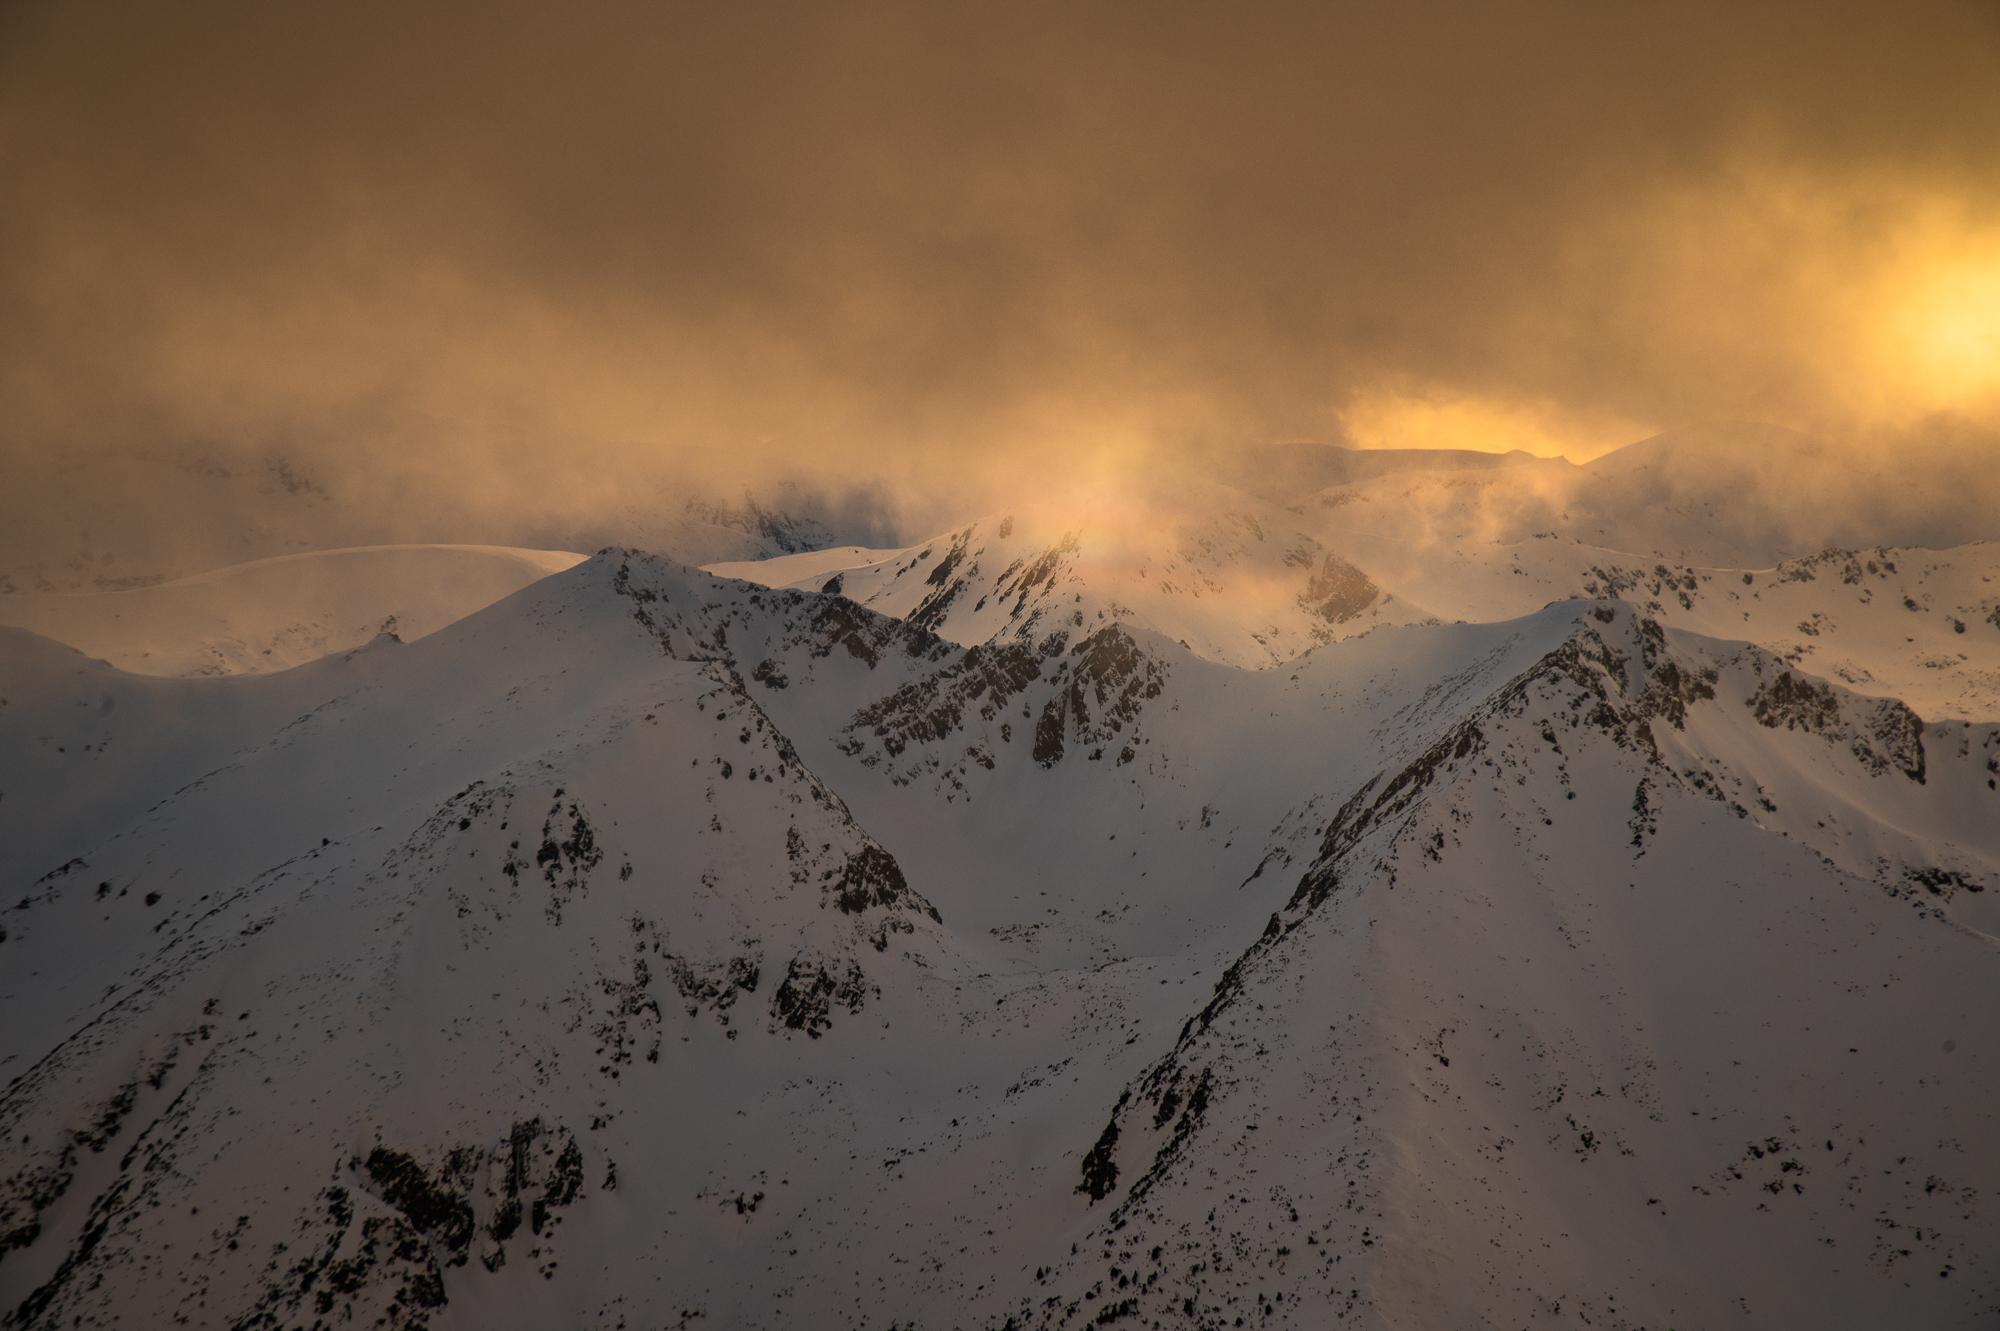 Skakavetz peaks, Rila